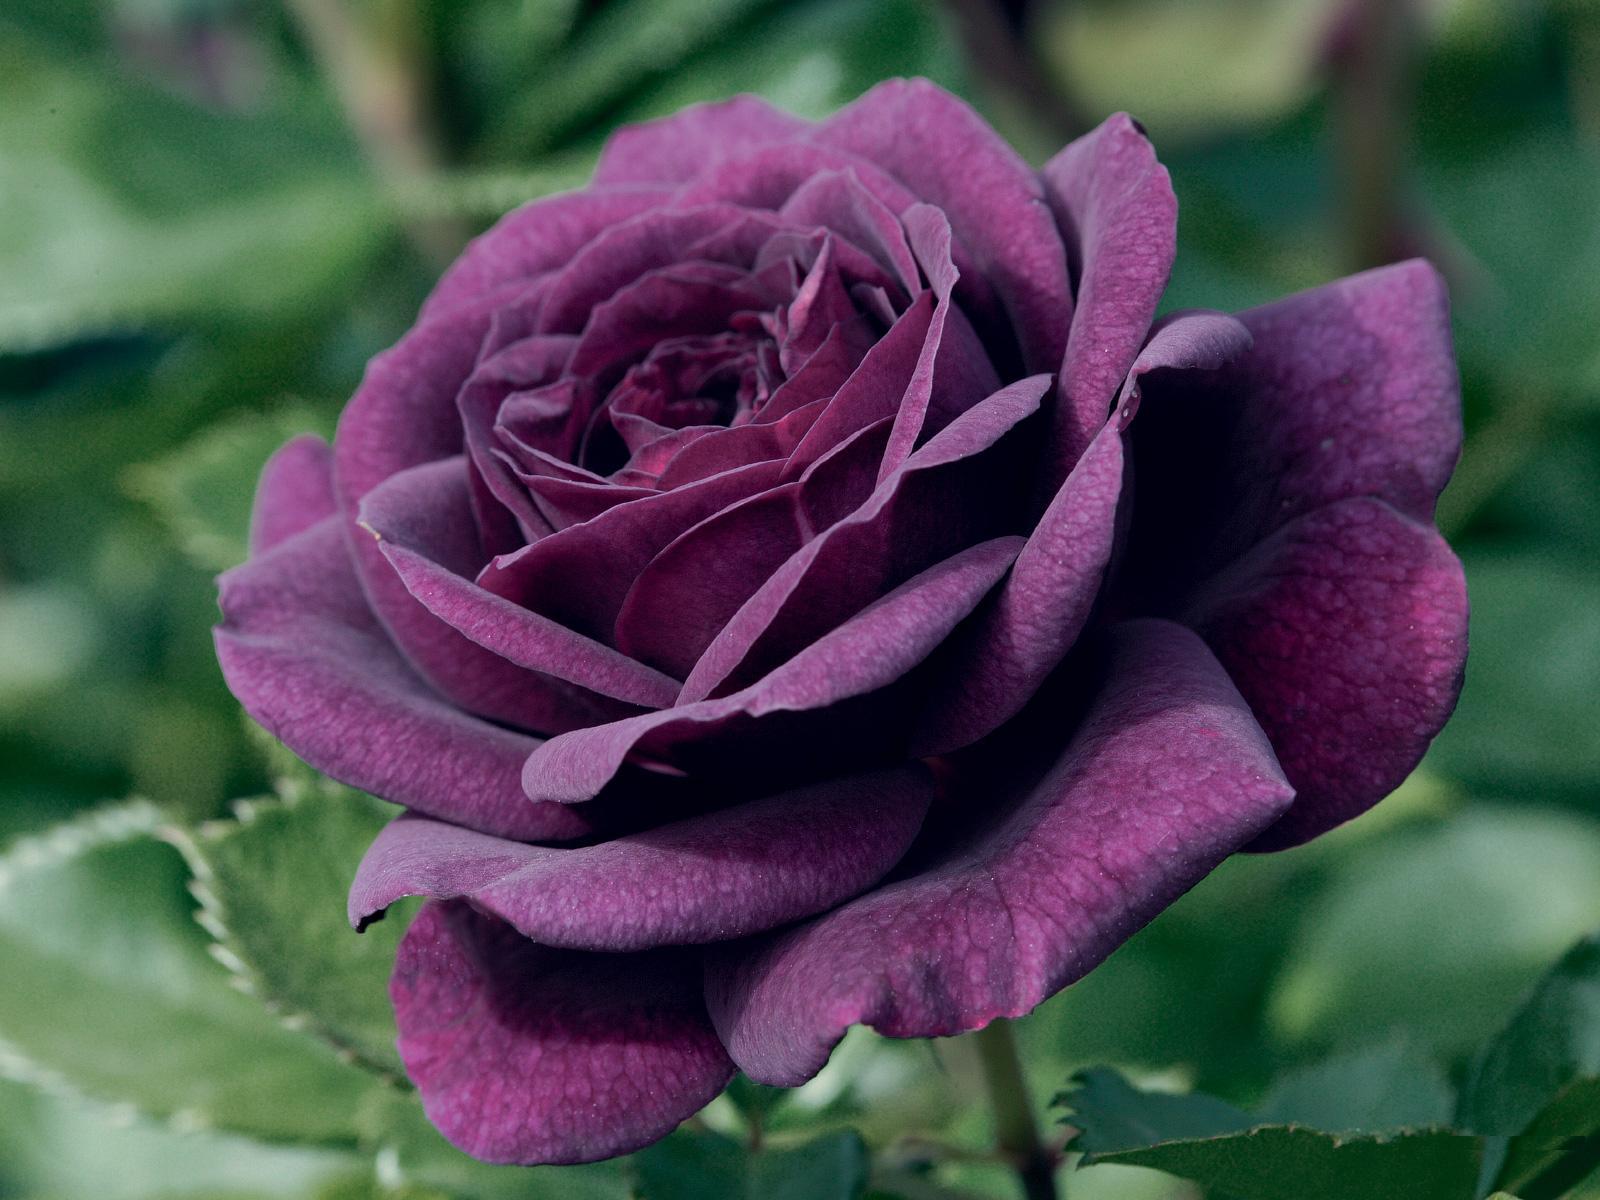 Deep Purple Rose wallpaper 1080p (1600 x 1200 )